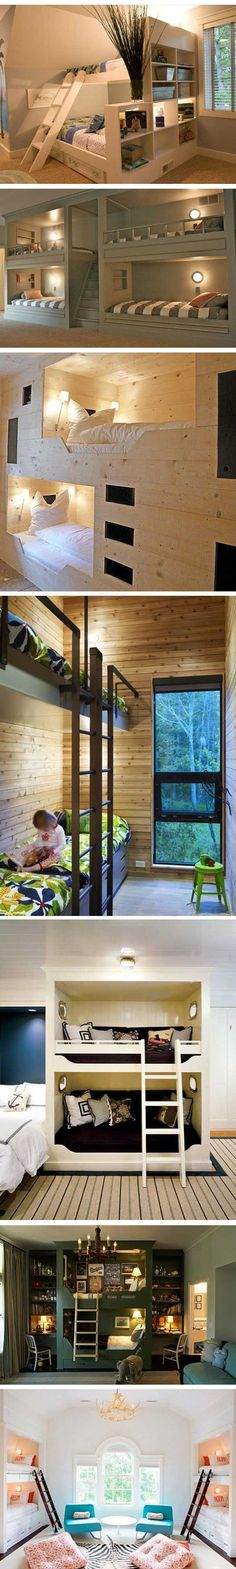 cool bunkbeds ◉ re-pinned by http://www.waterfront-properties.com/pbgoldmarshclub.php